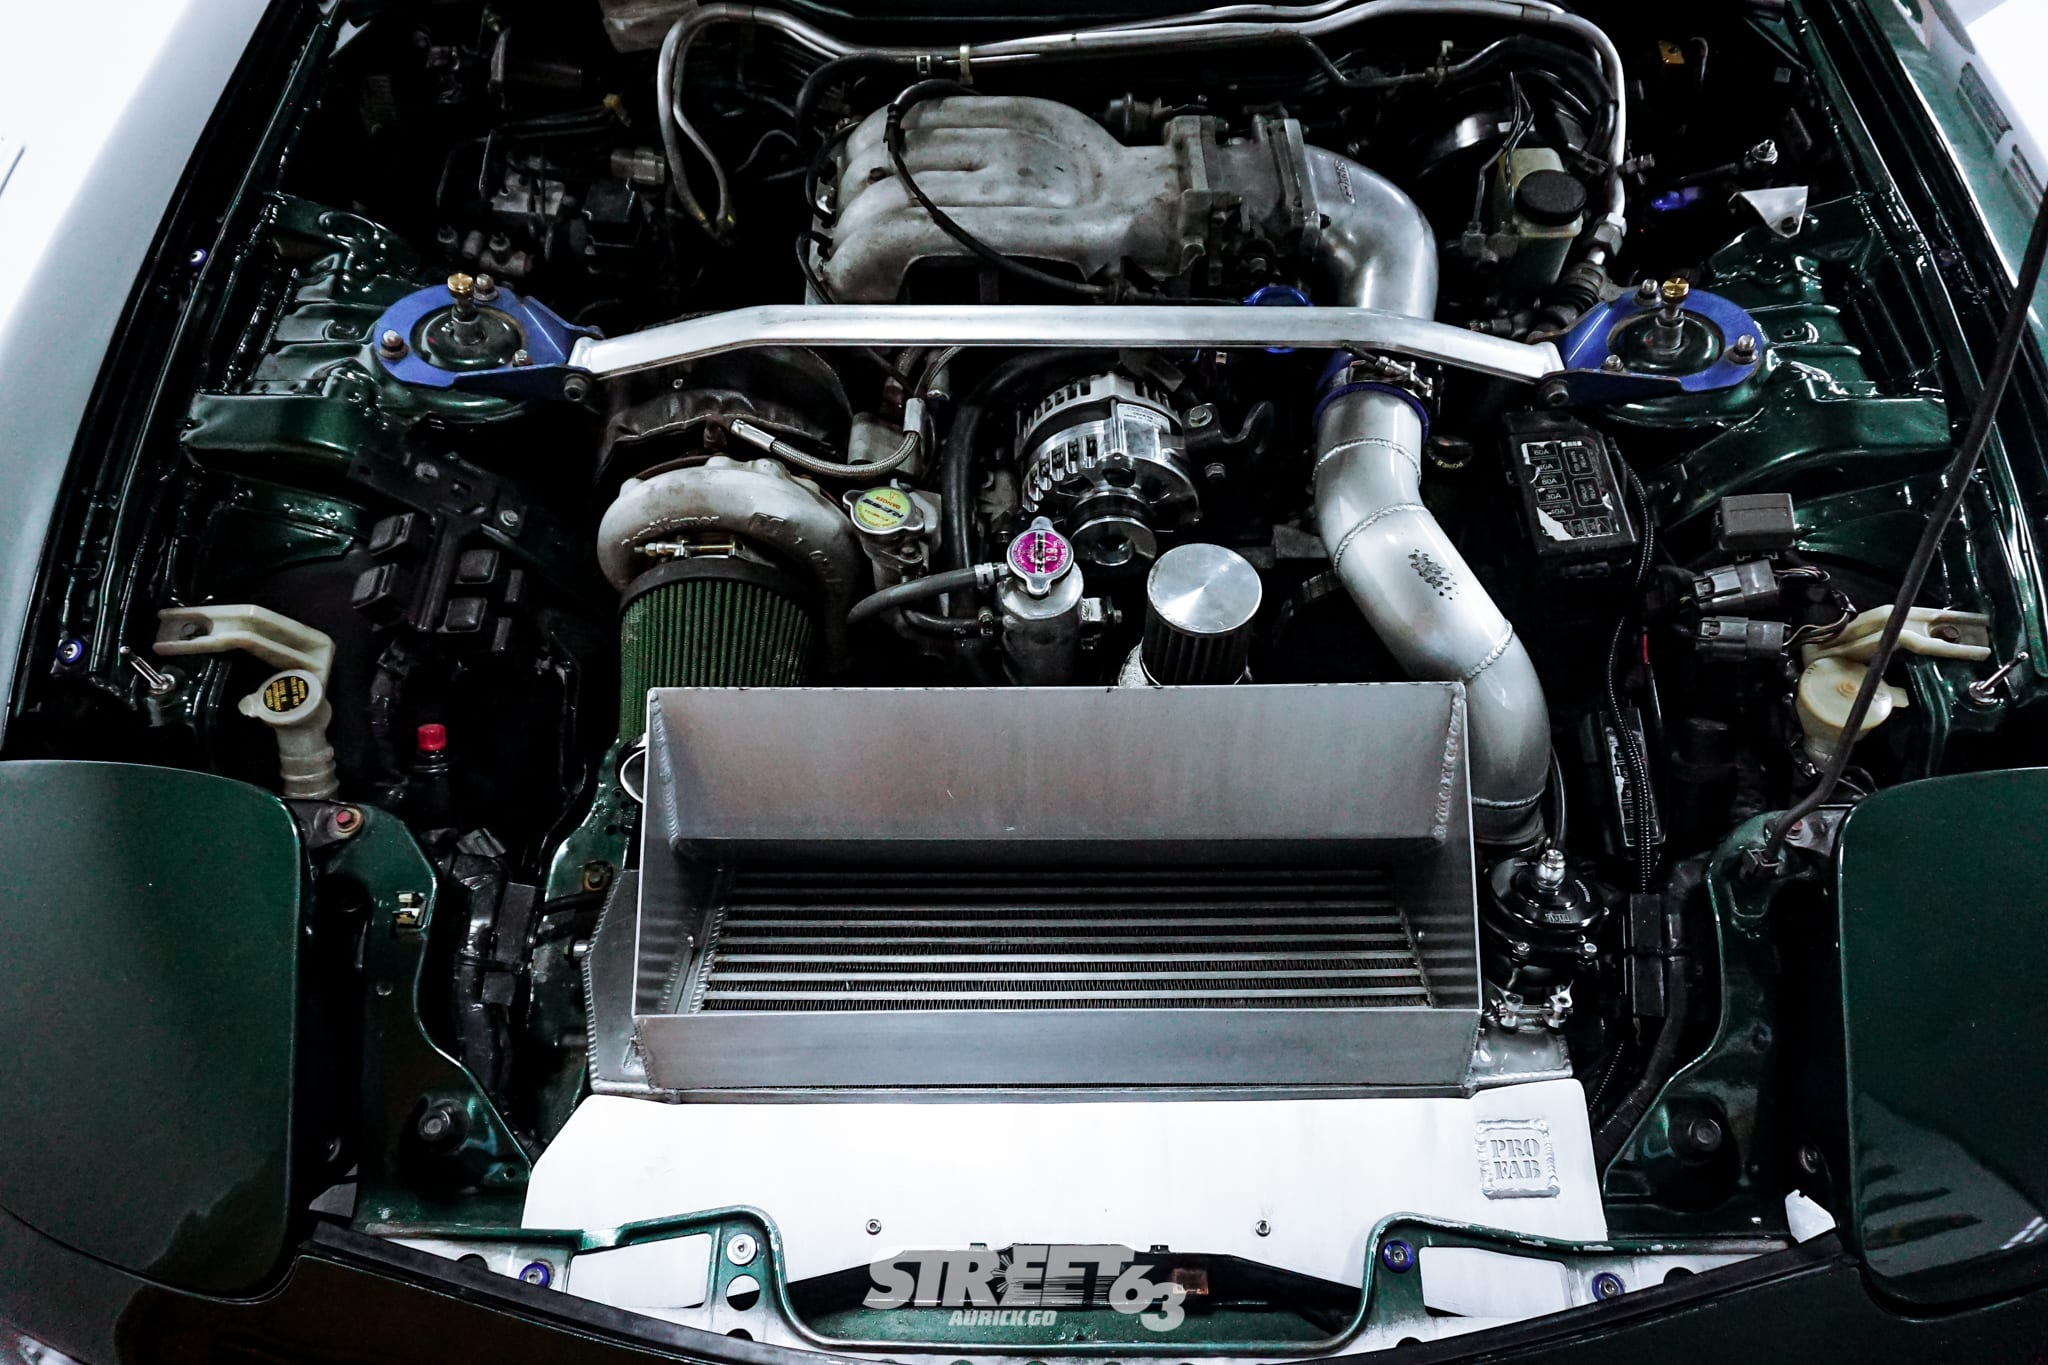 RX7 - 9